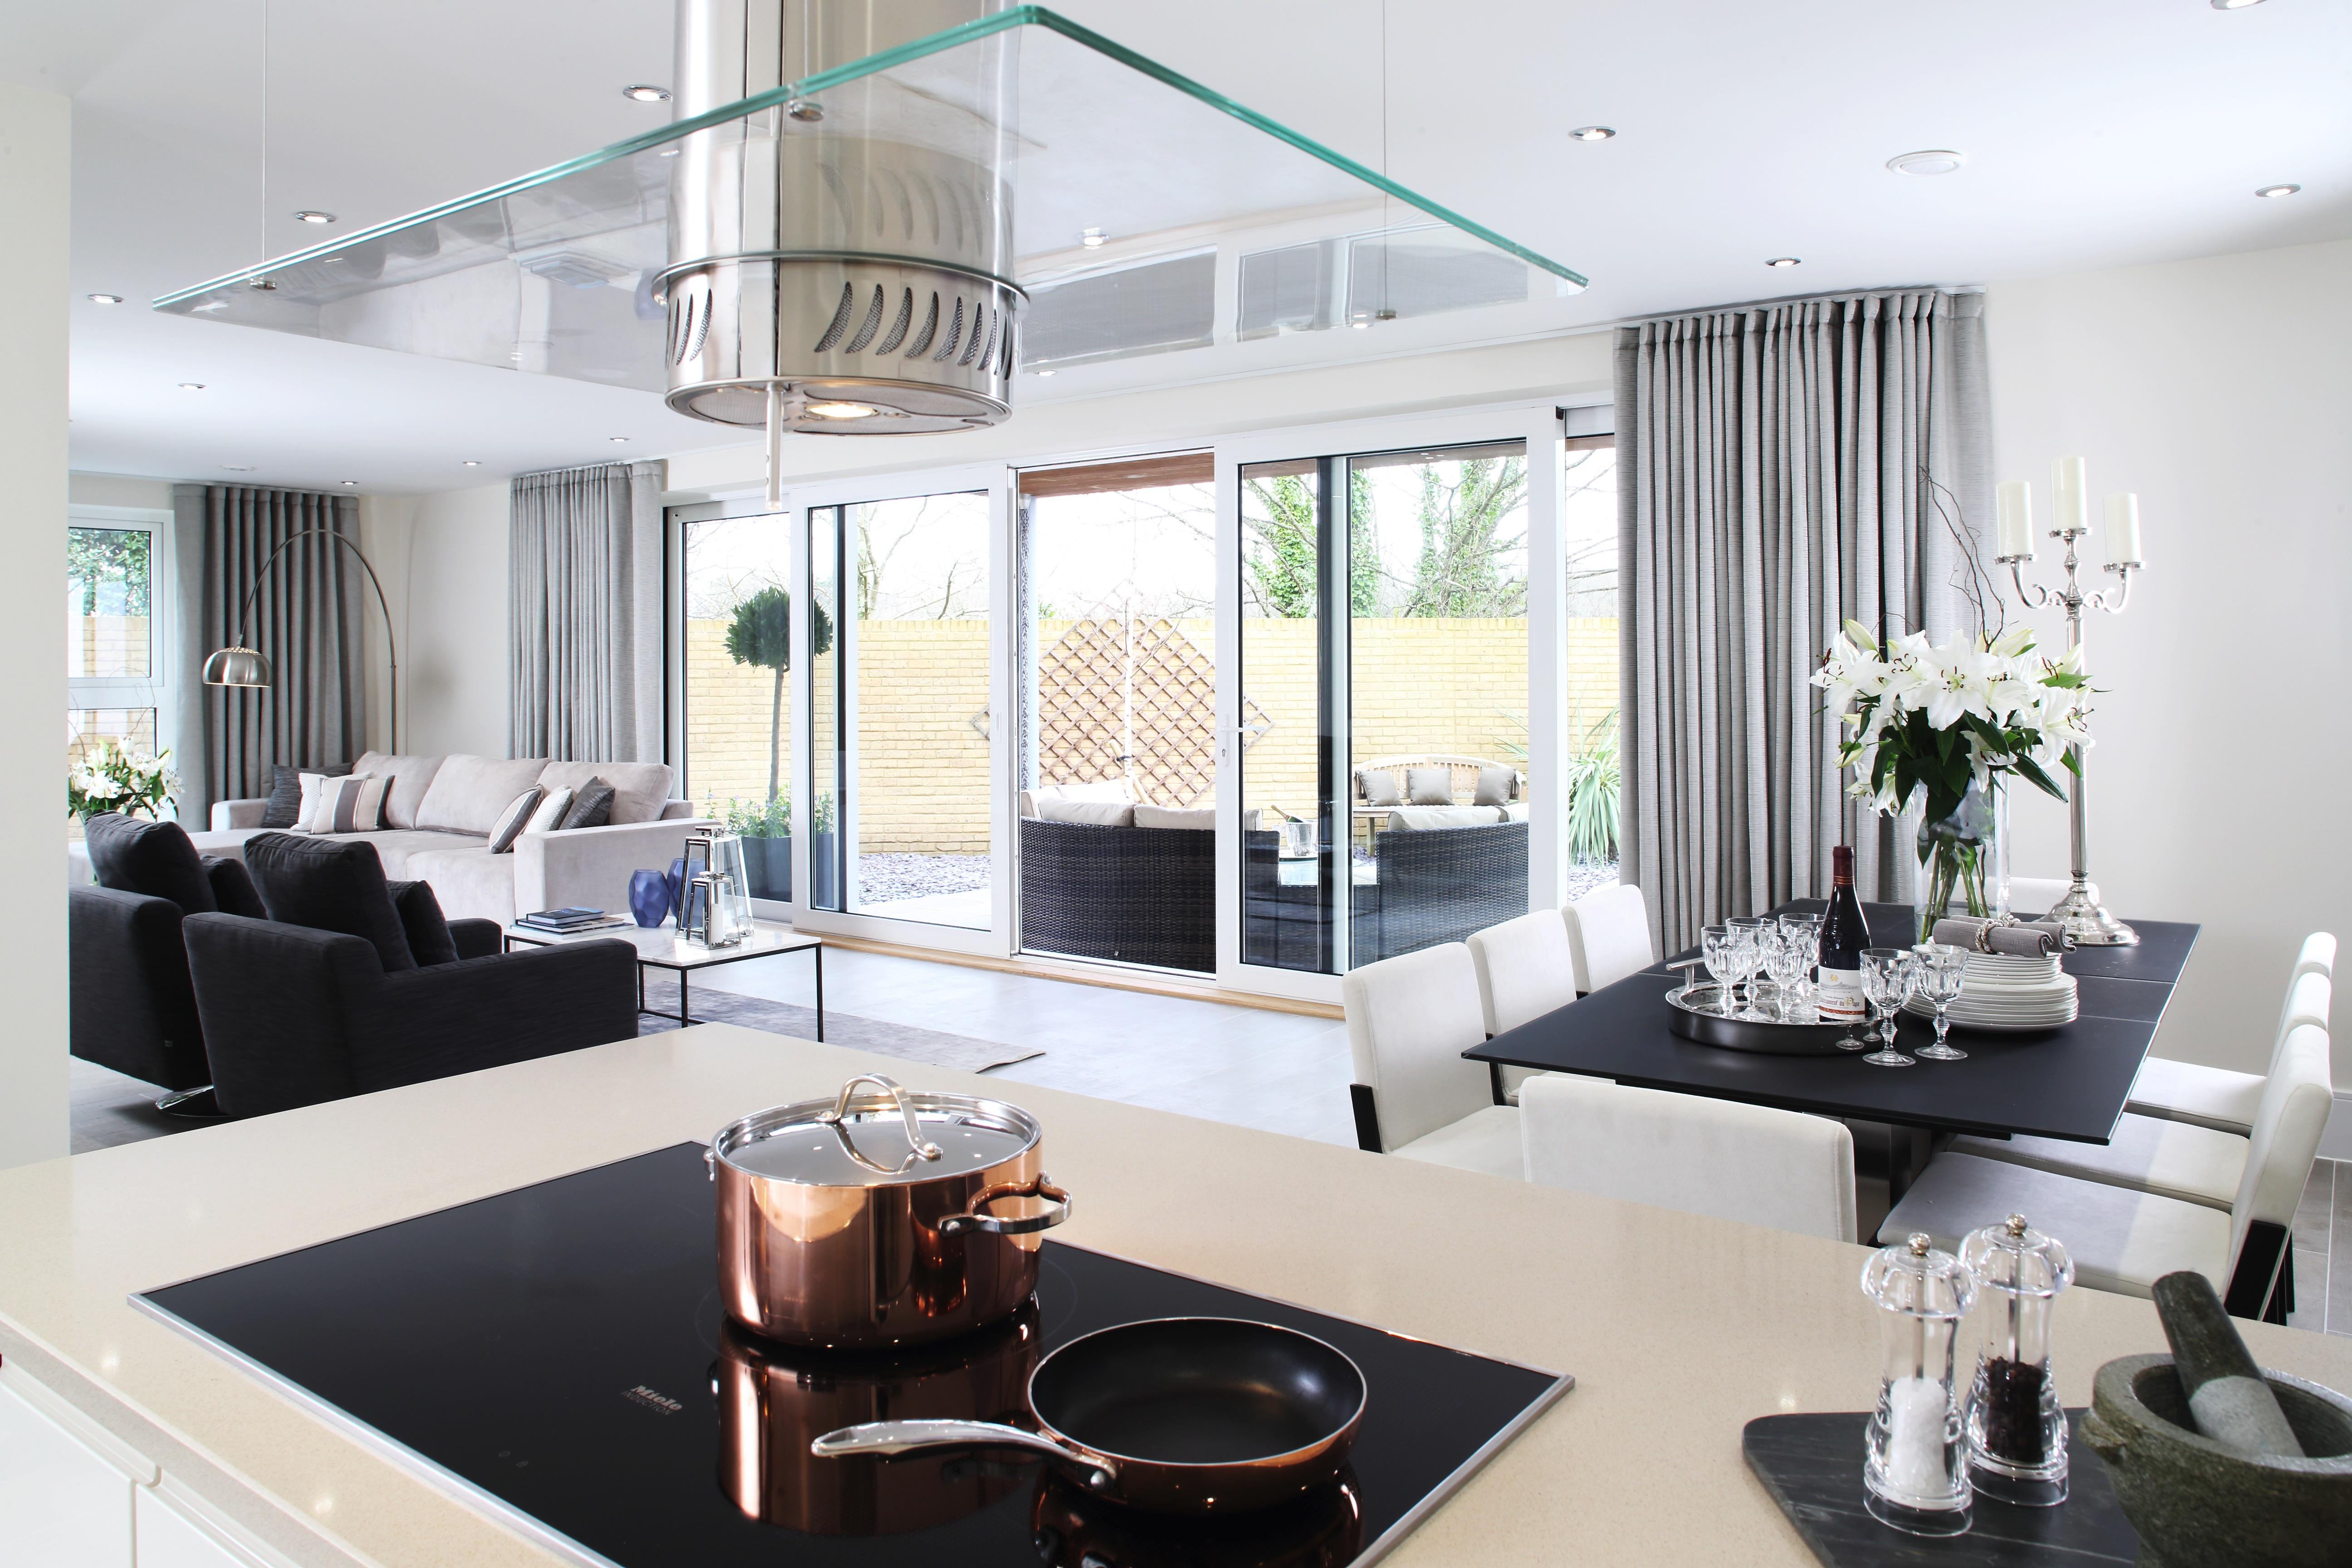 Redrow,Villas At Lymington Shores,Silestone,Siemens,Appliance